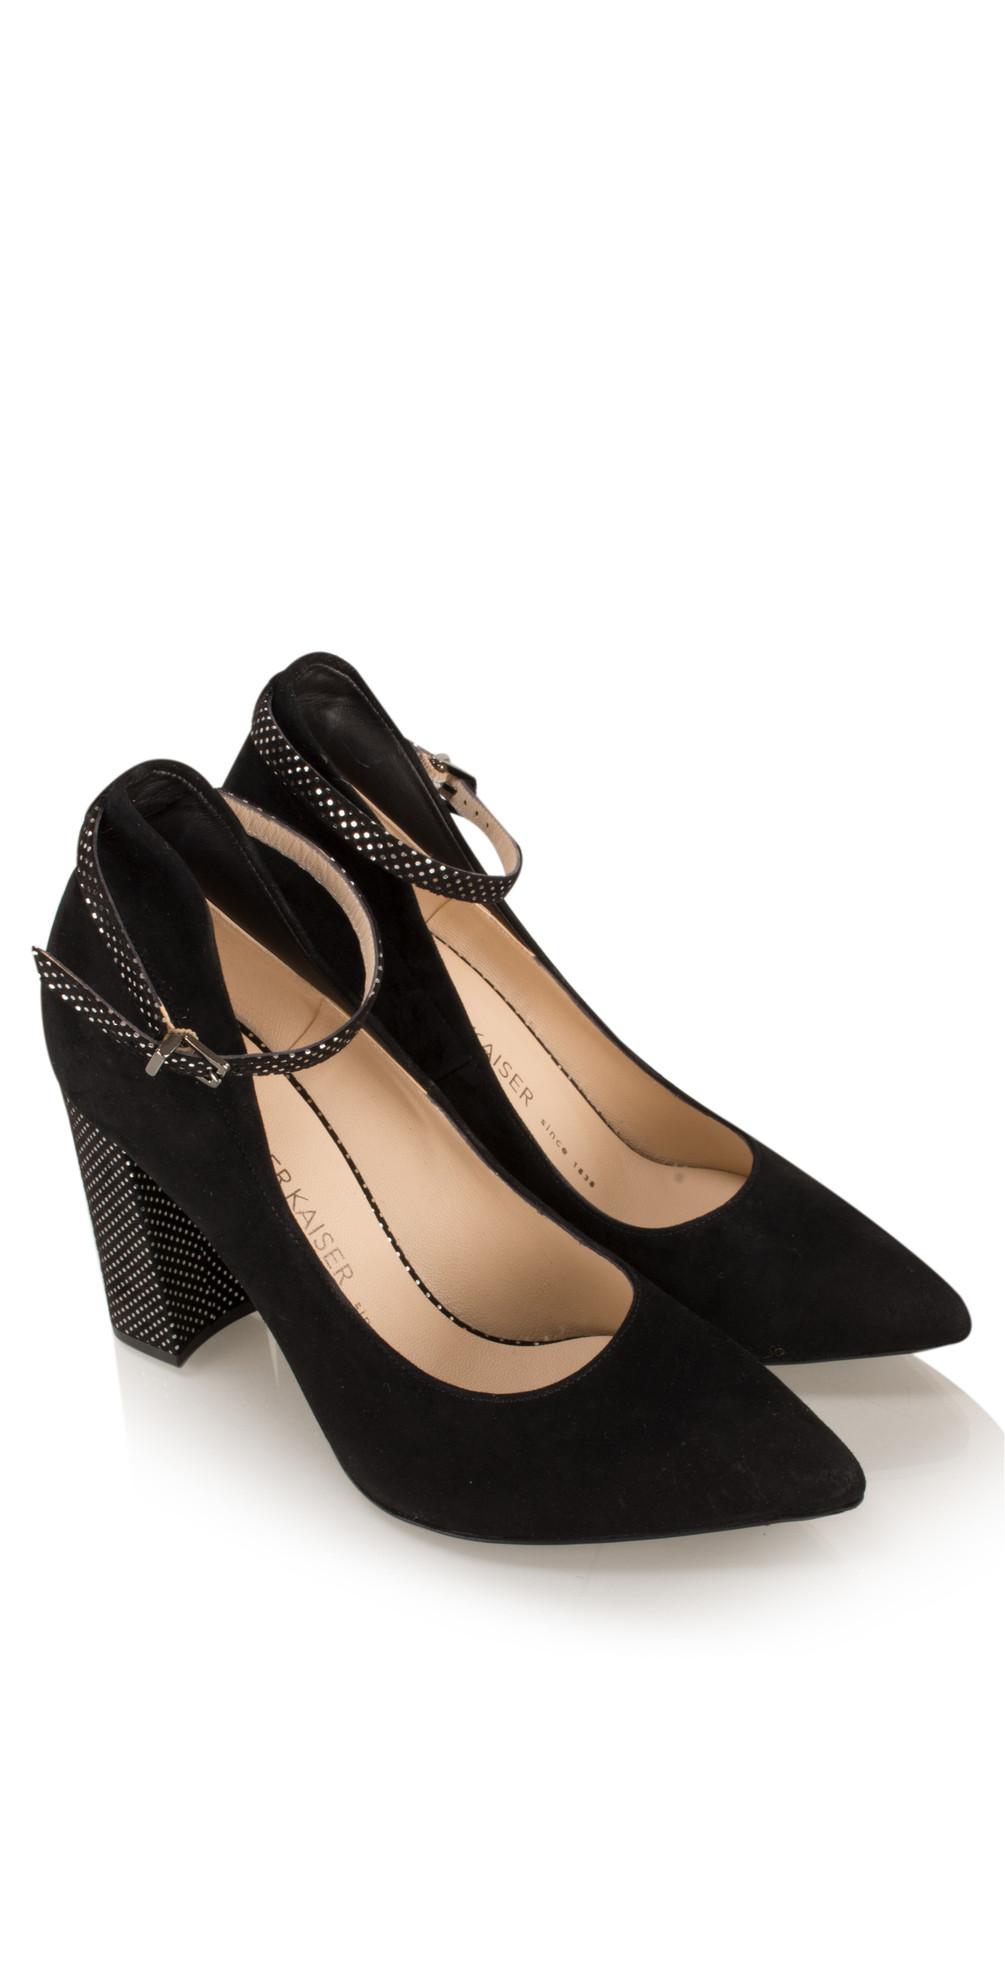 Atina Ankle Strap Shoe main image